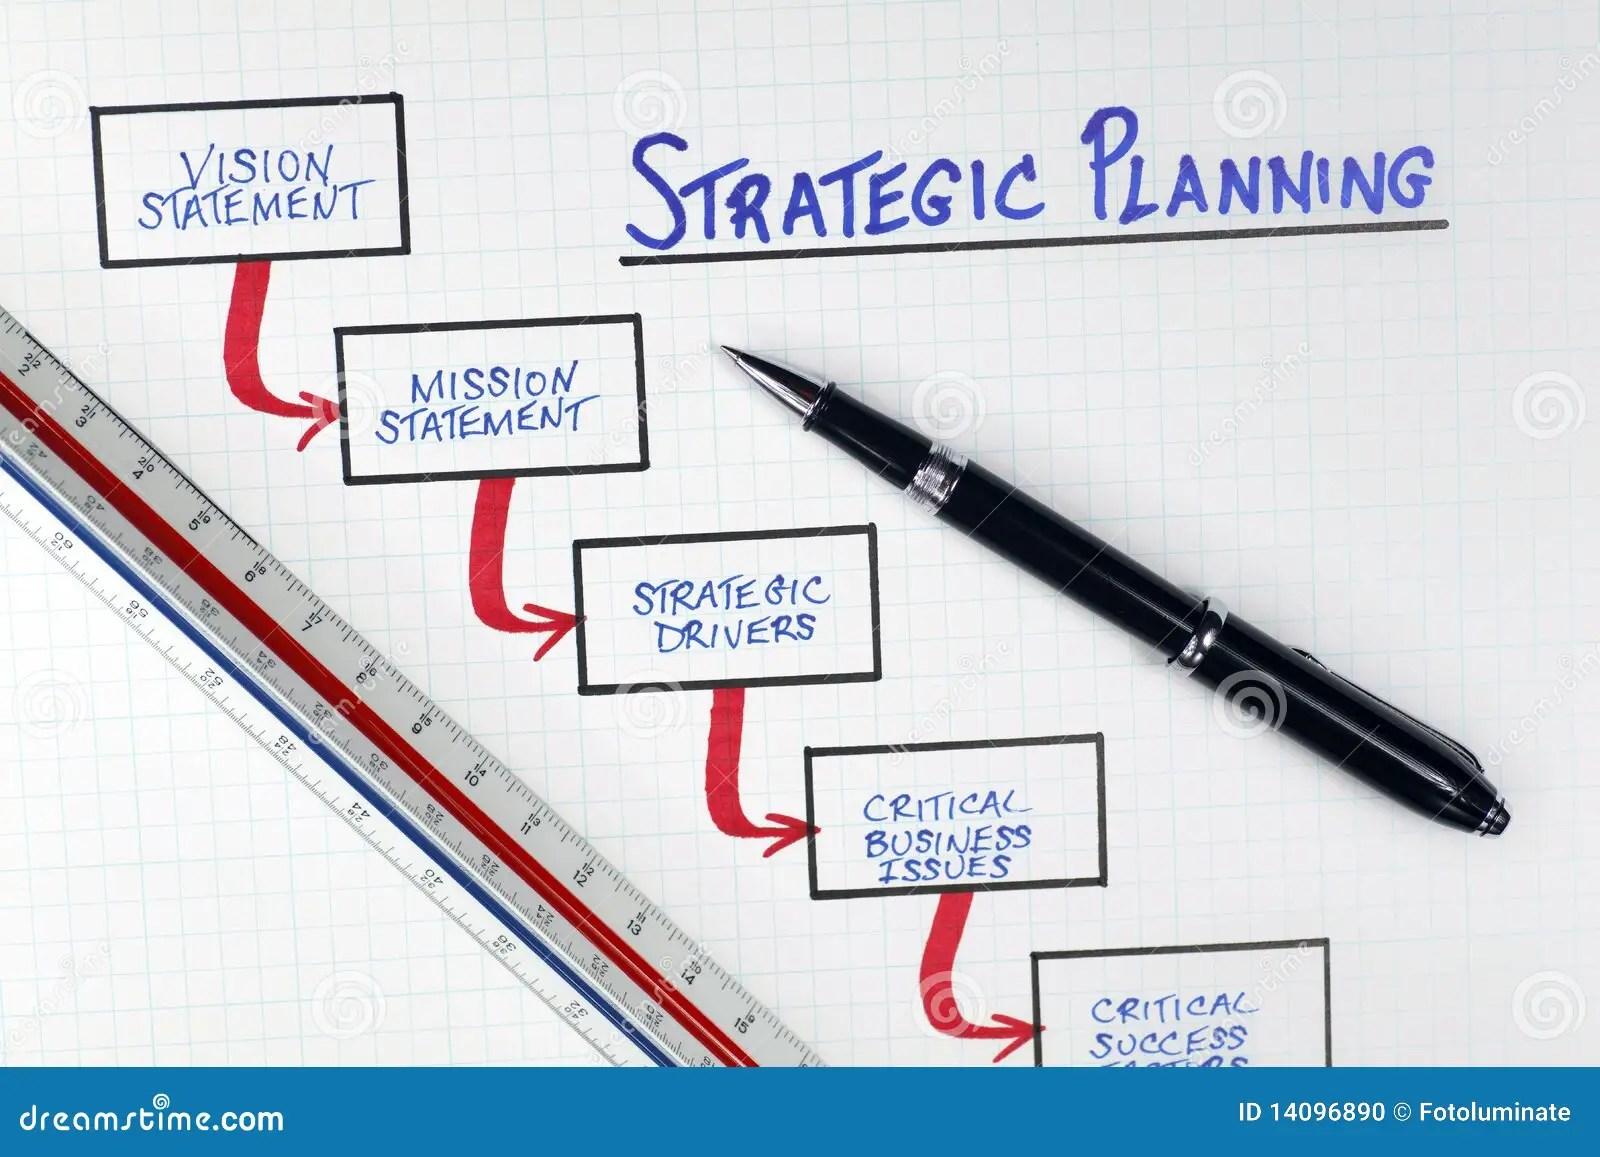 strategic planning framework diagram 1998 honda civic hatchback radio wiring business stock photo